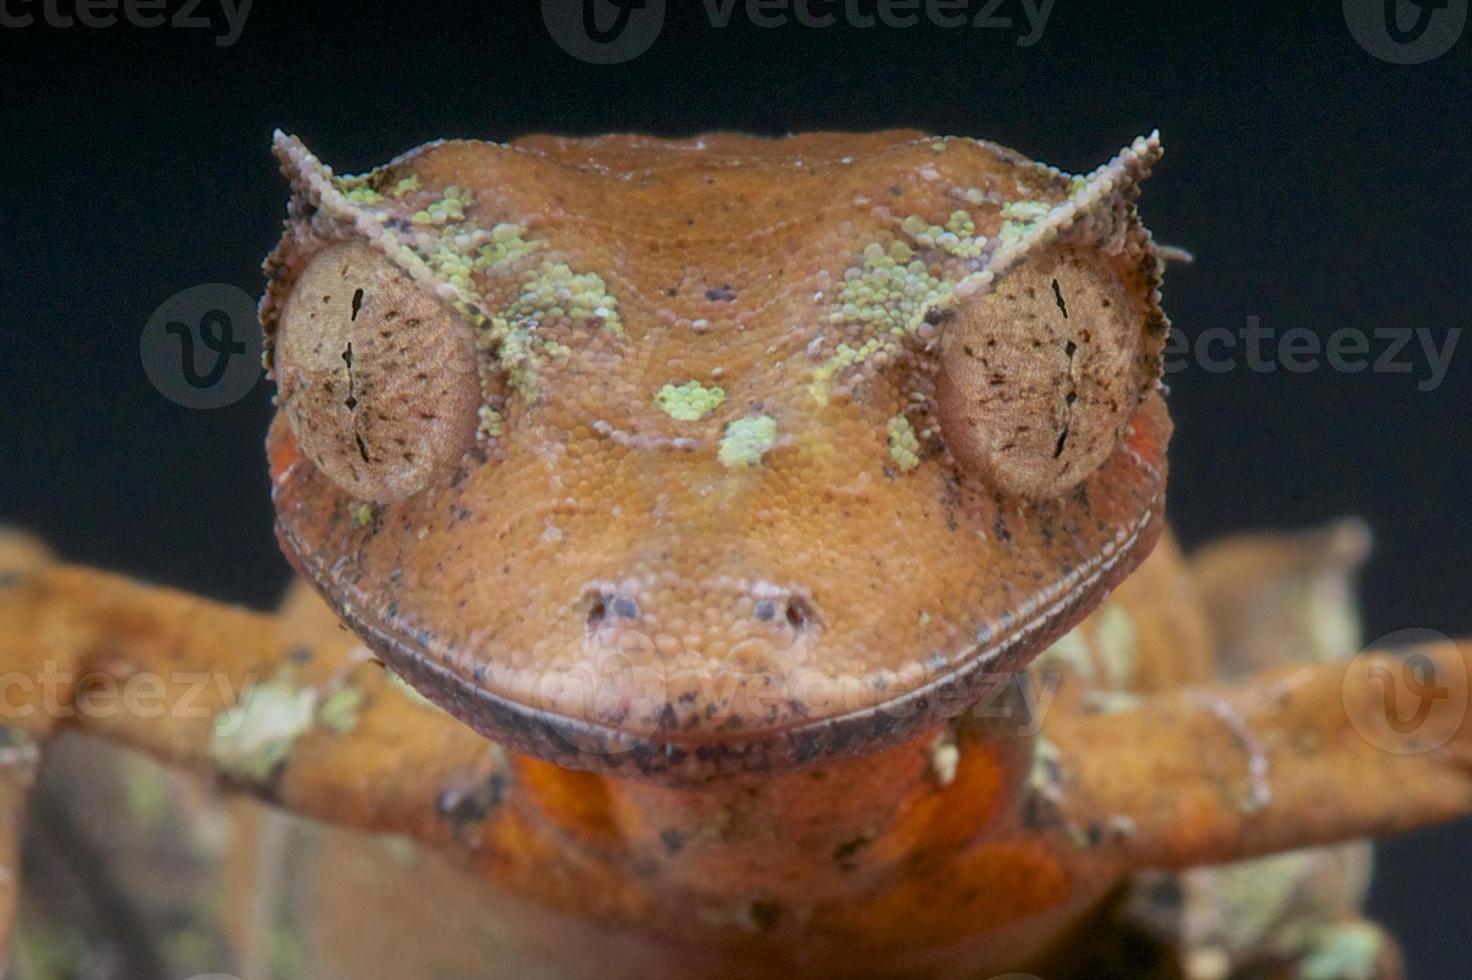 Satanic leaf-tailed gecko / Uroplatus phantasticus photo